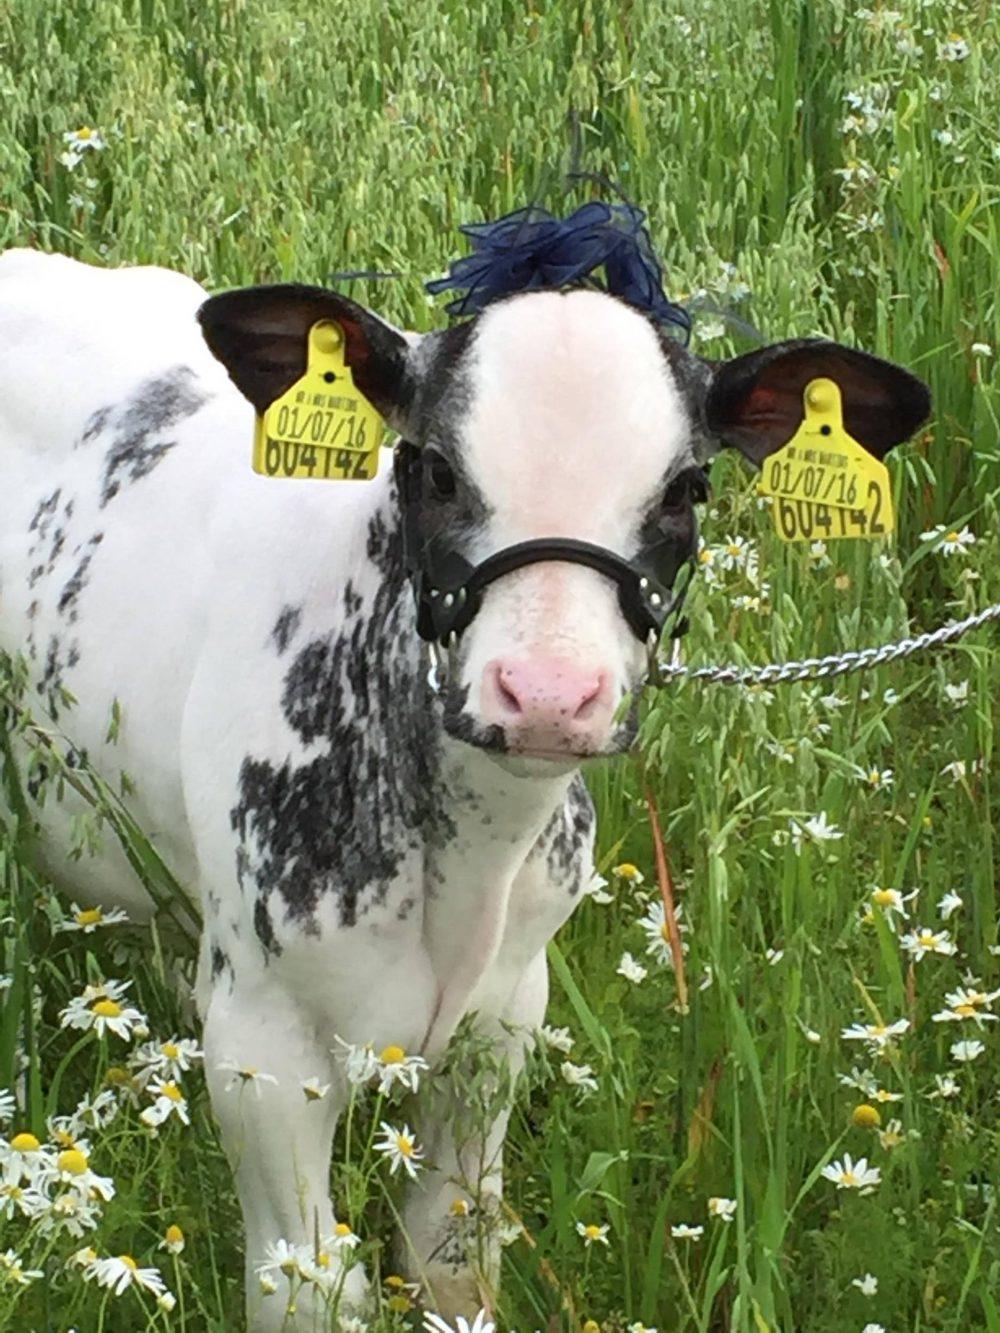 Lazuli the calf wearing a blue fascinator | Agriculture News UK